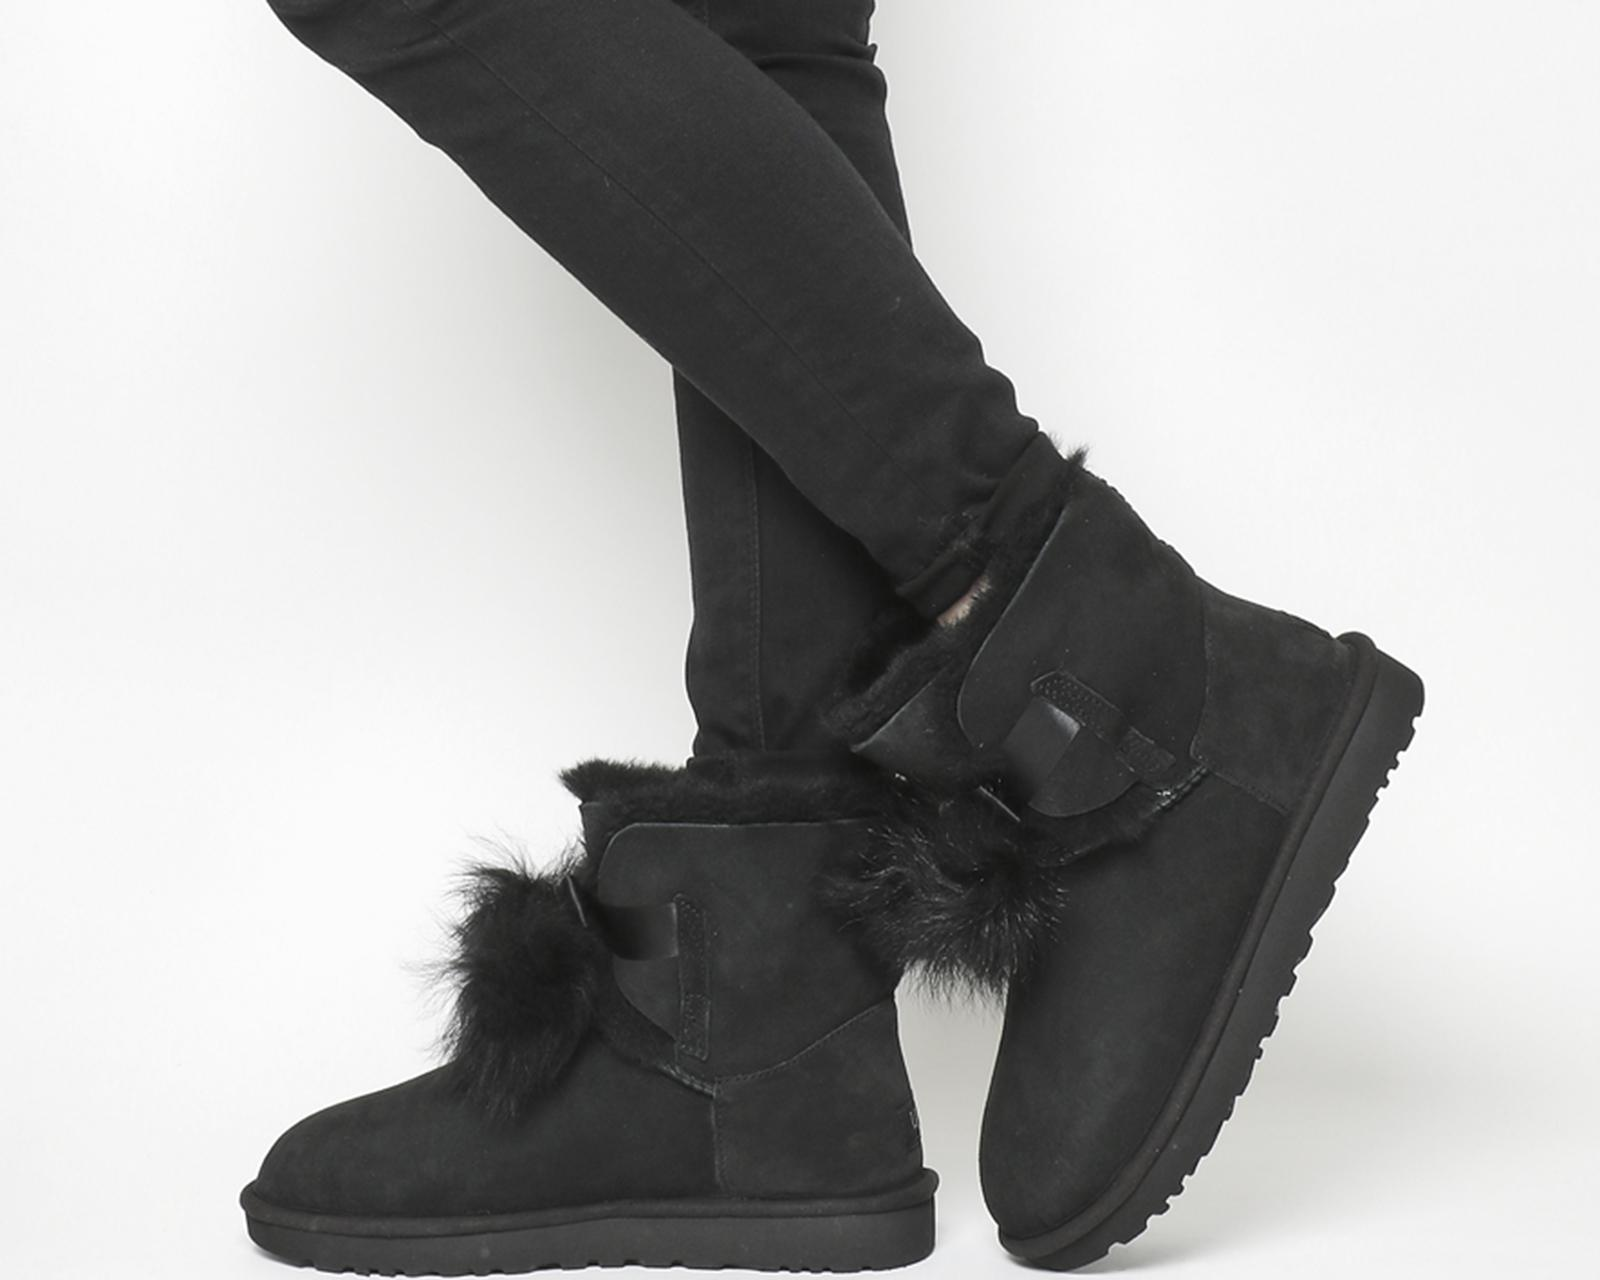 e9d9013faa59 In Black Lyst Pom Boots Ugg Gita UnqITY